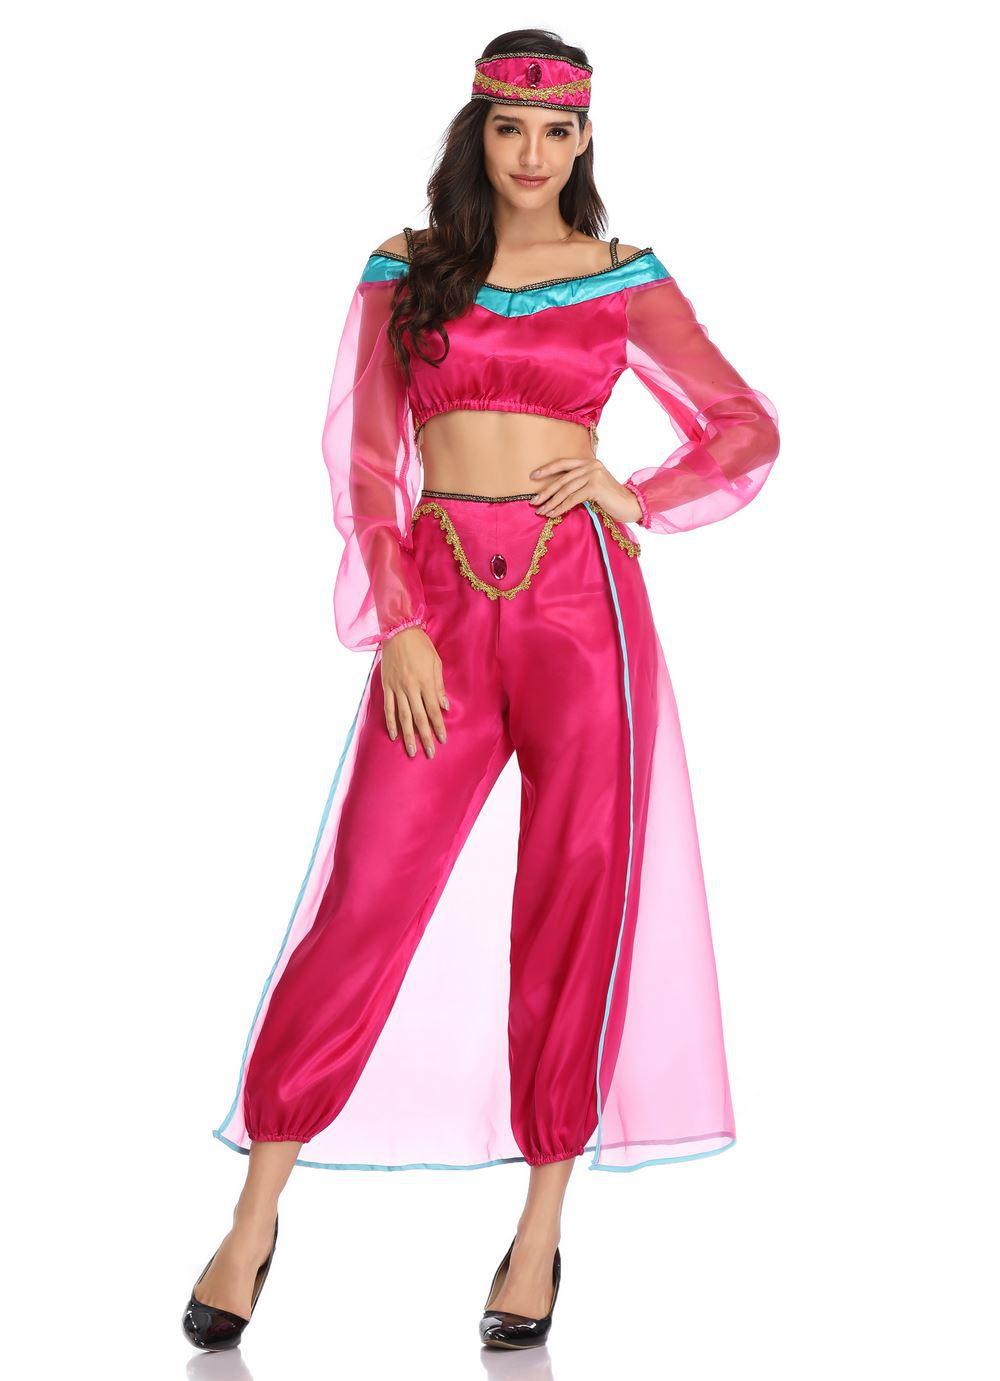 Aladdin Sexy movie aladdin costume sexy jasmine princess dress women girl